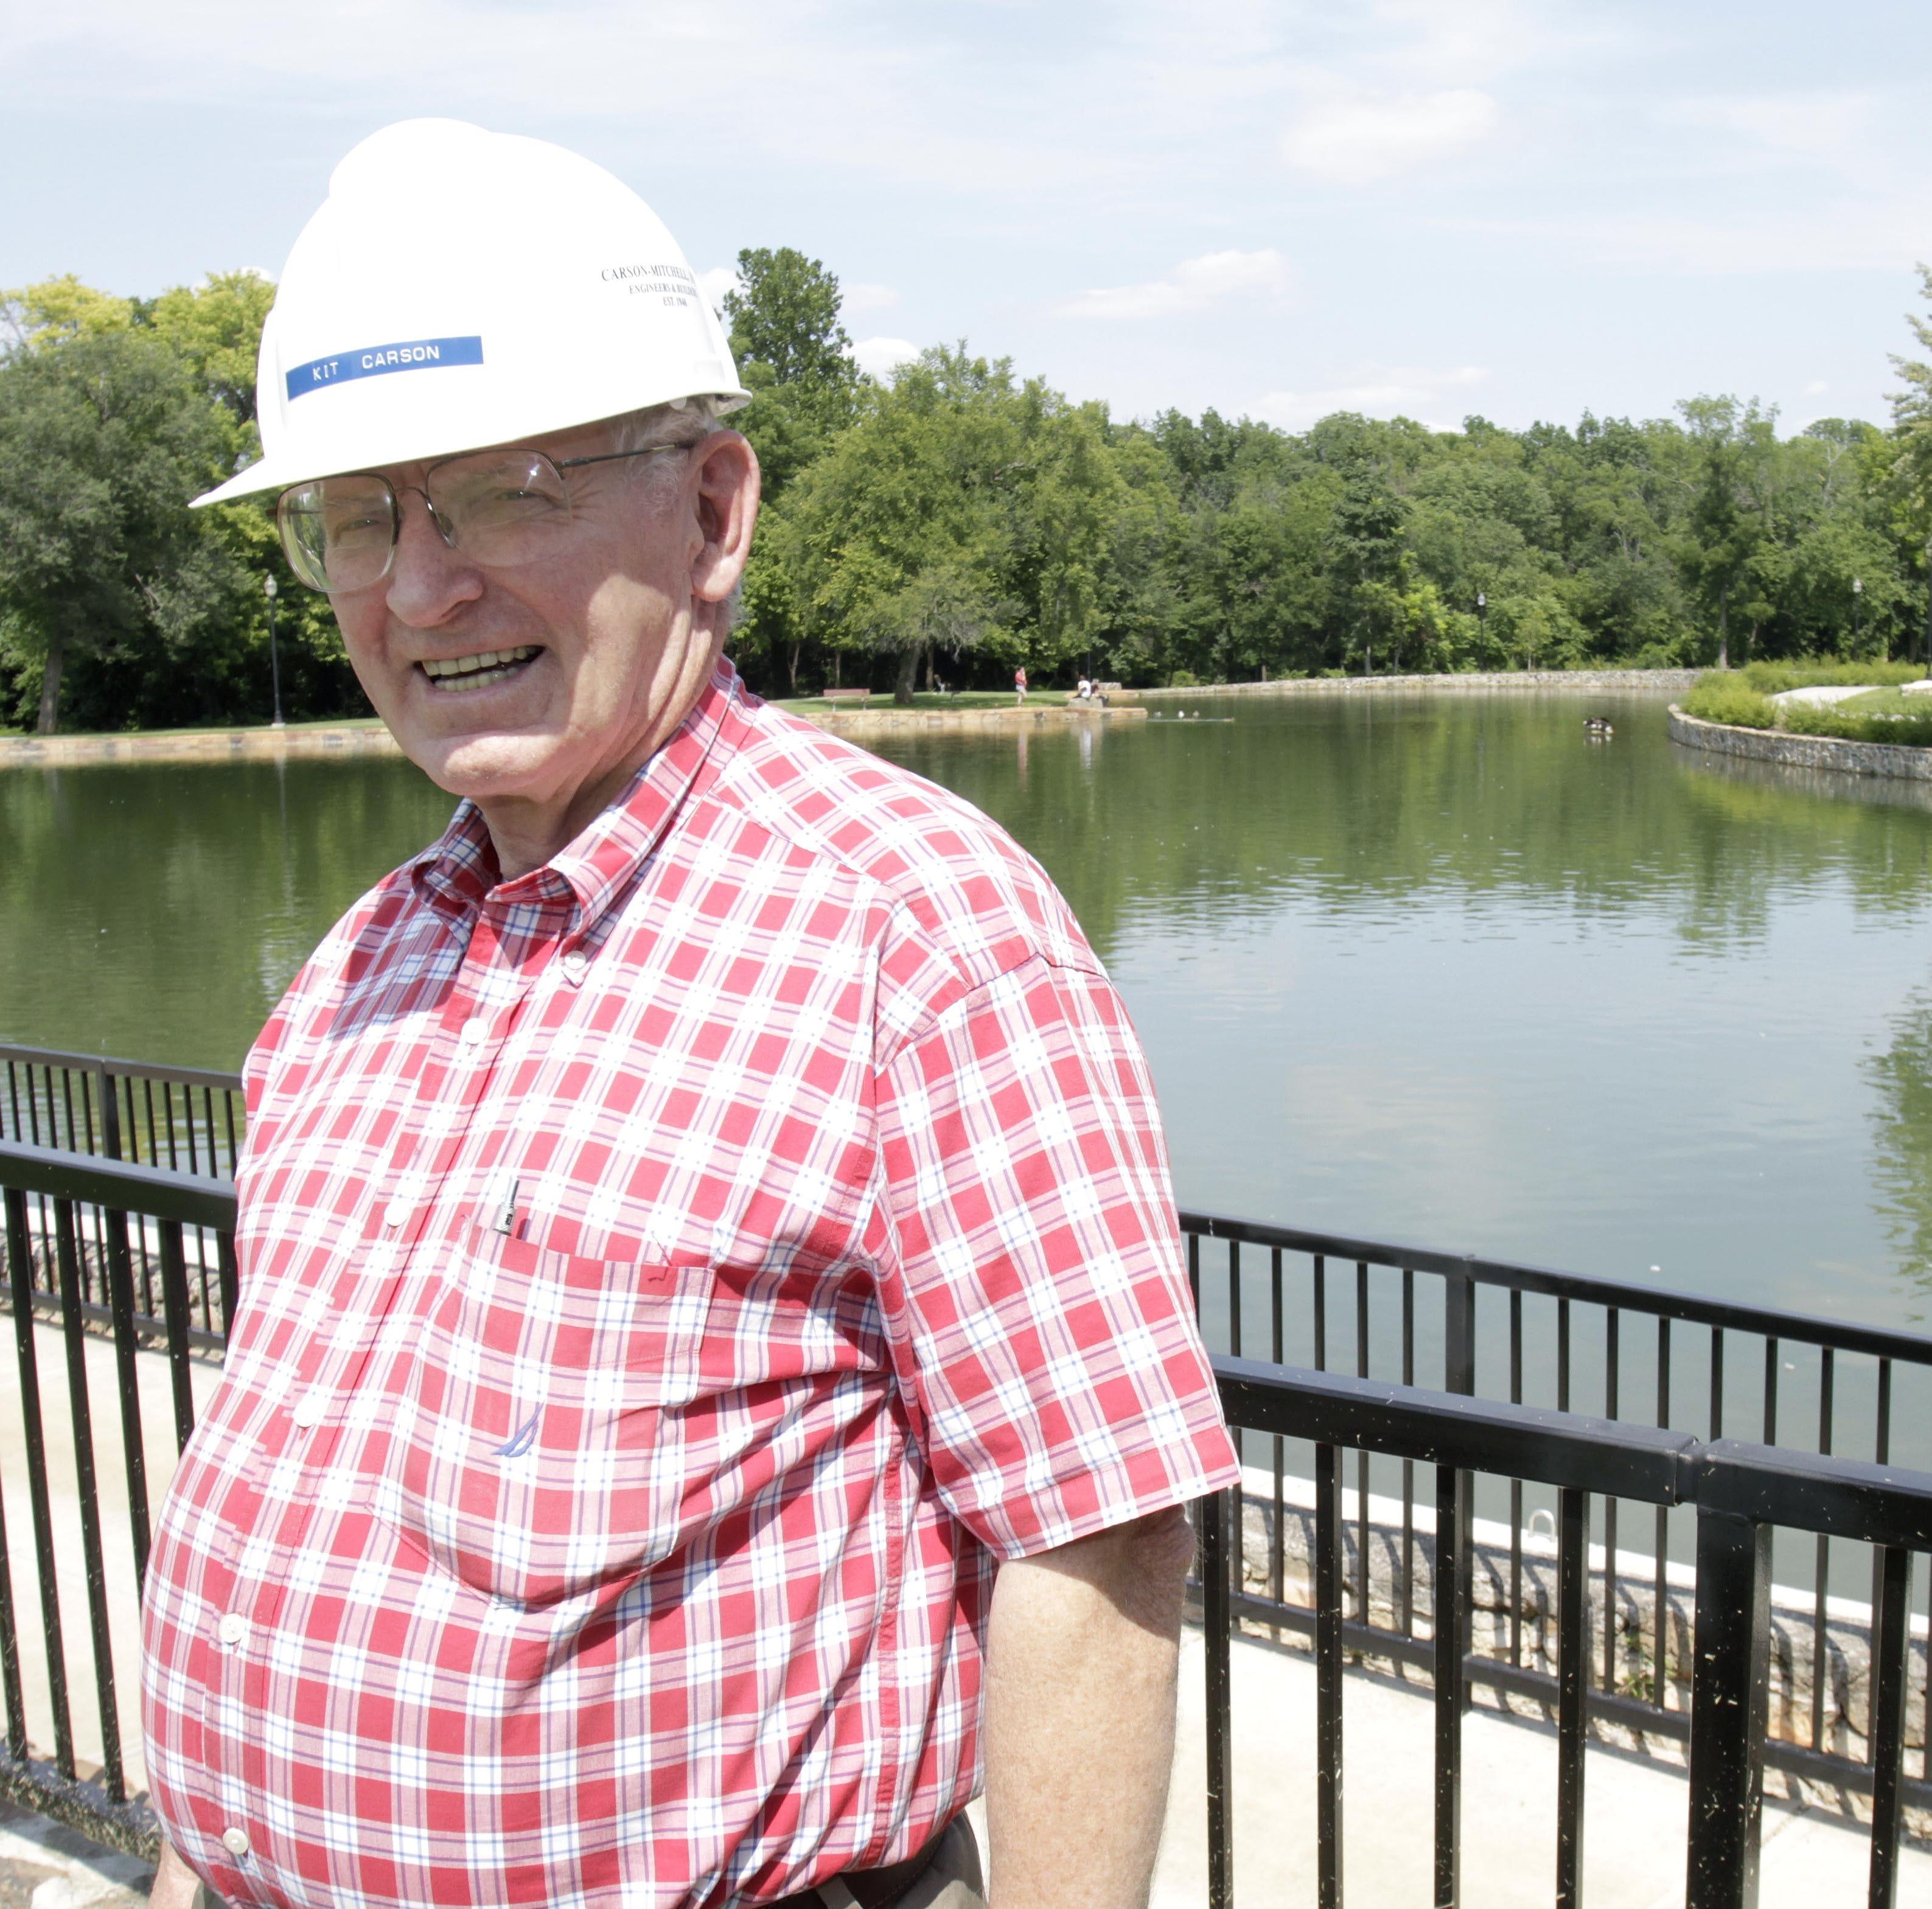 Beloved storyteller and Springfield businessman Kit Carson died Monday